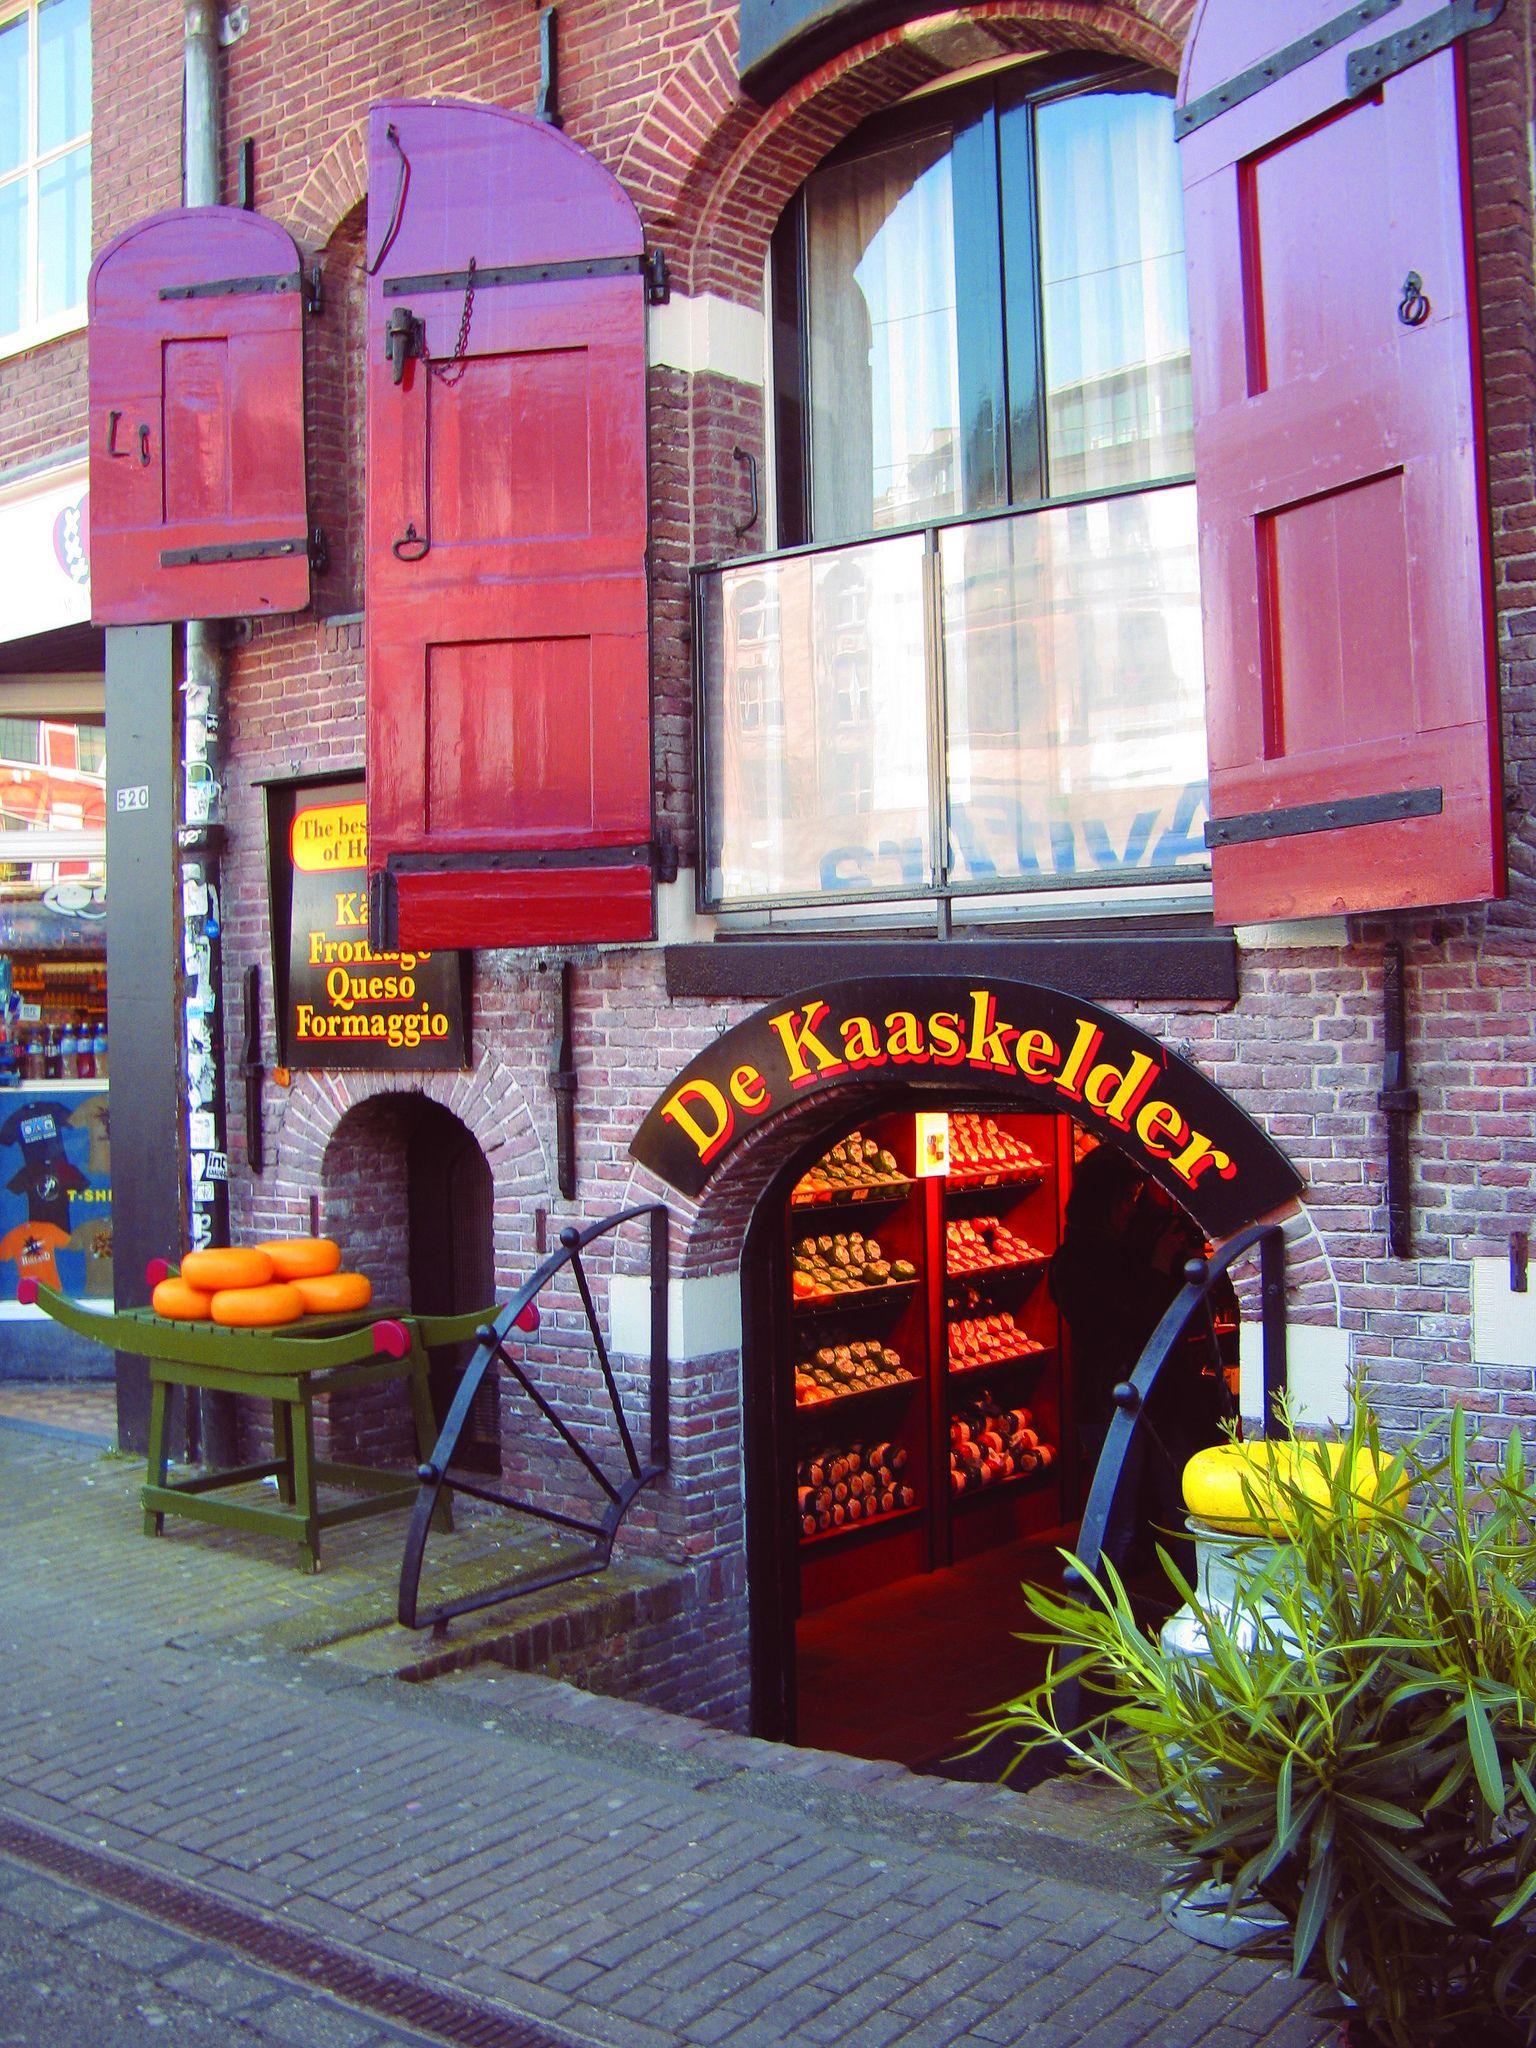 Amsterdam flower market | Flickr - Photo Sharing!